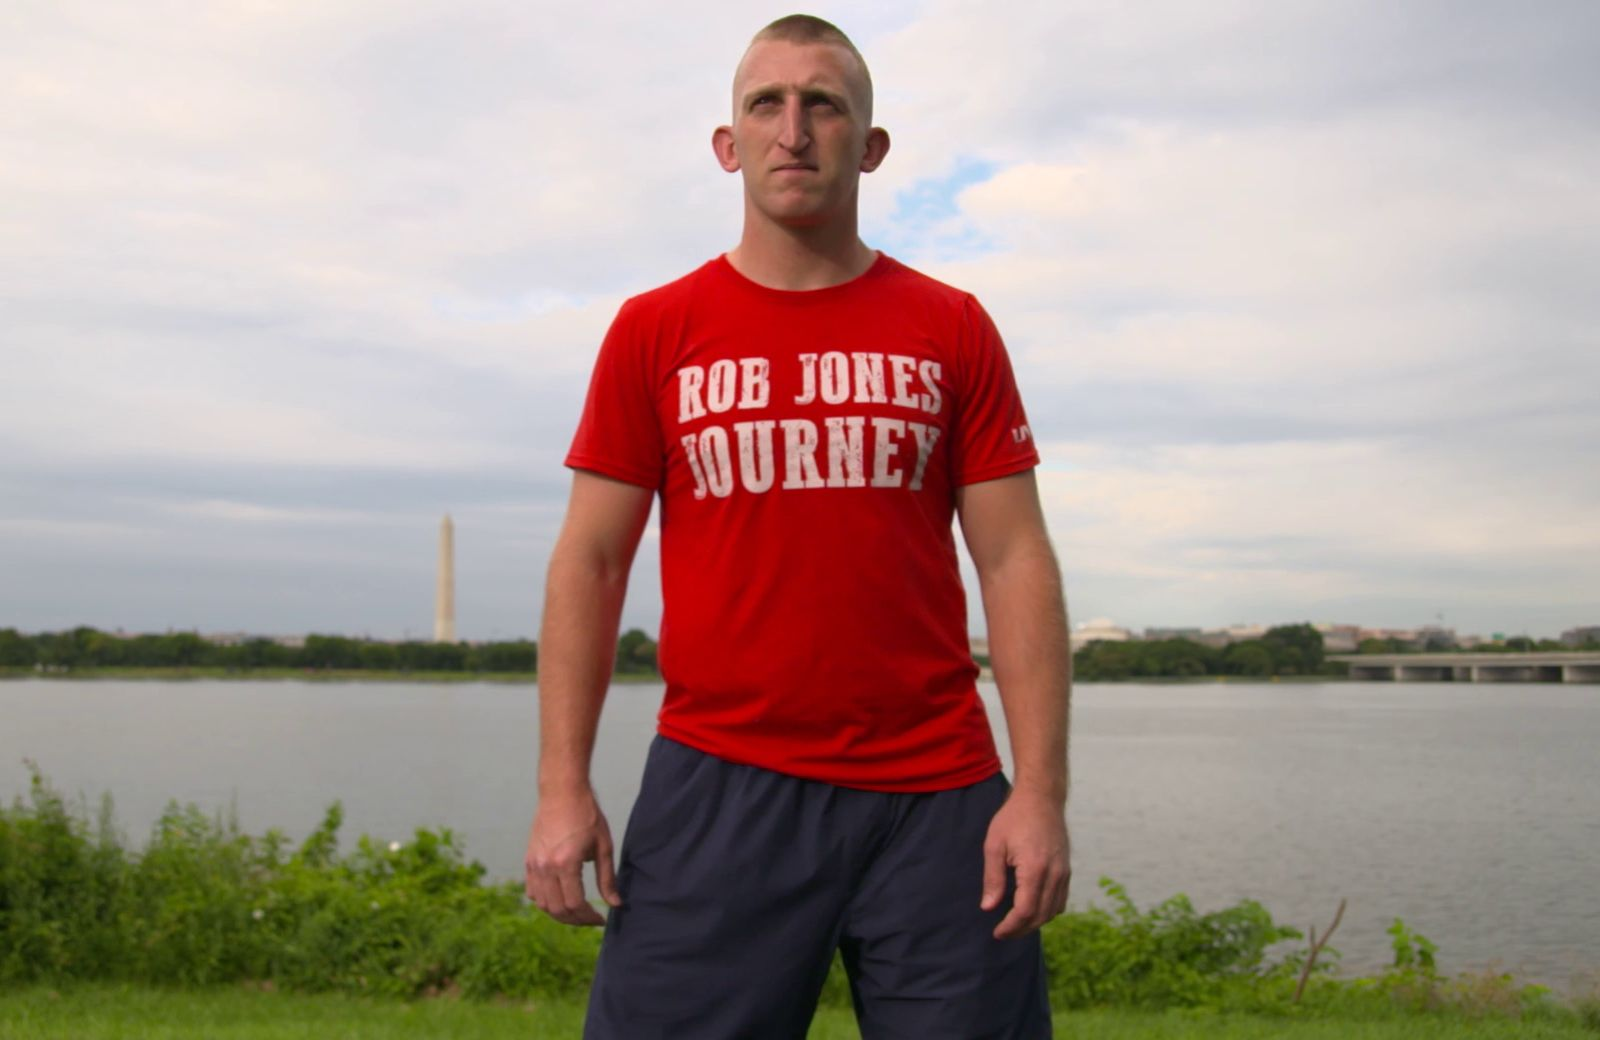 Main Event To Sponsor Rob Jones' Month Of Marathons